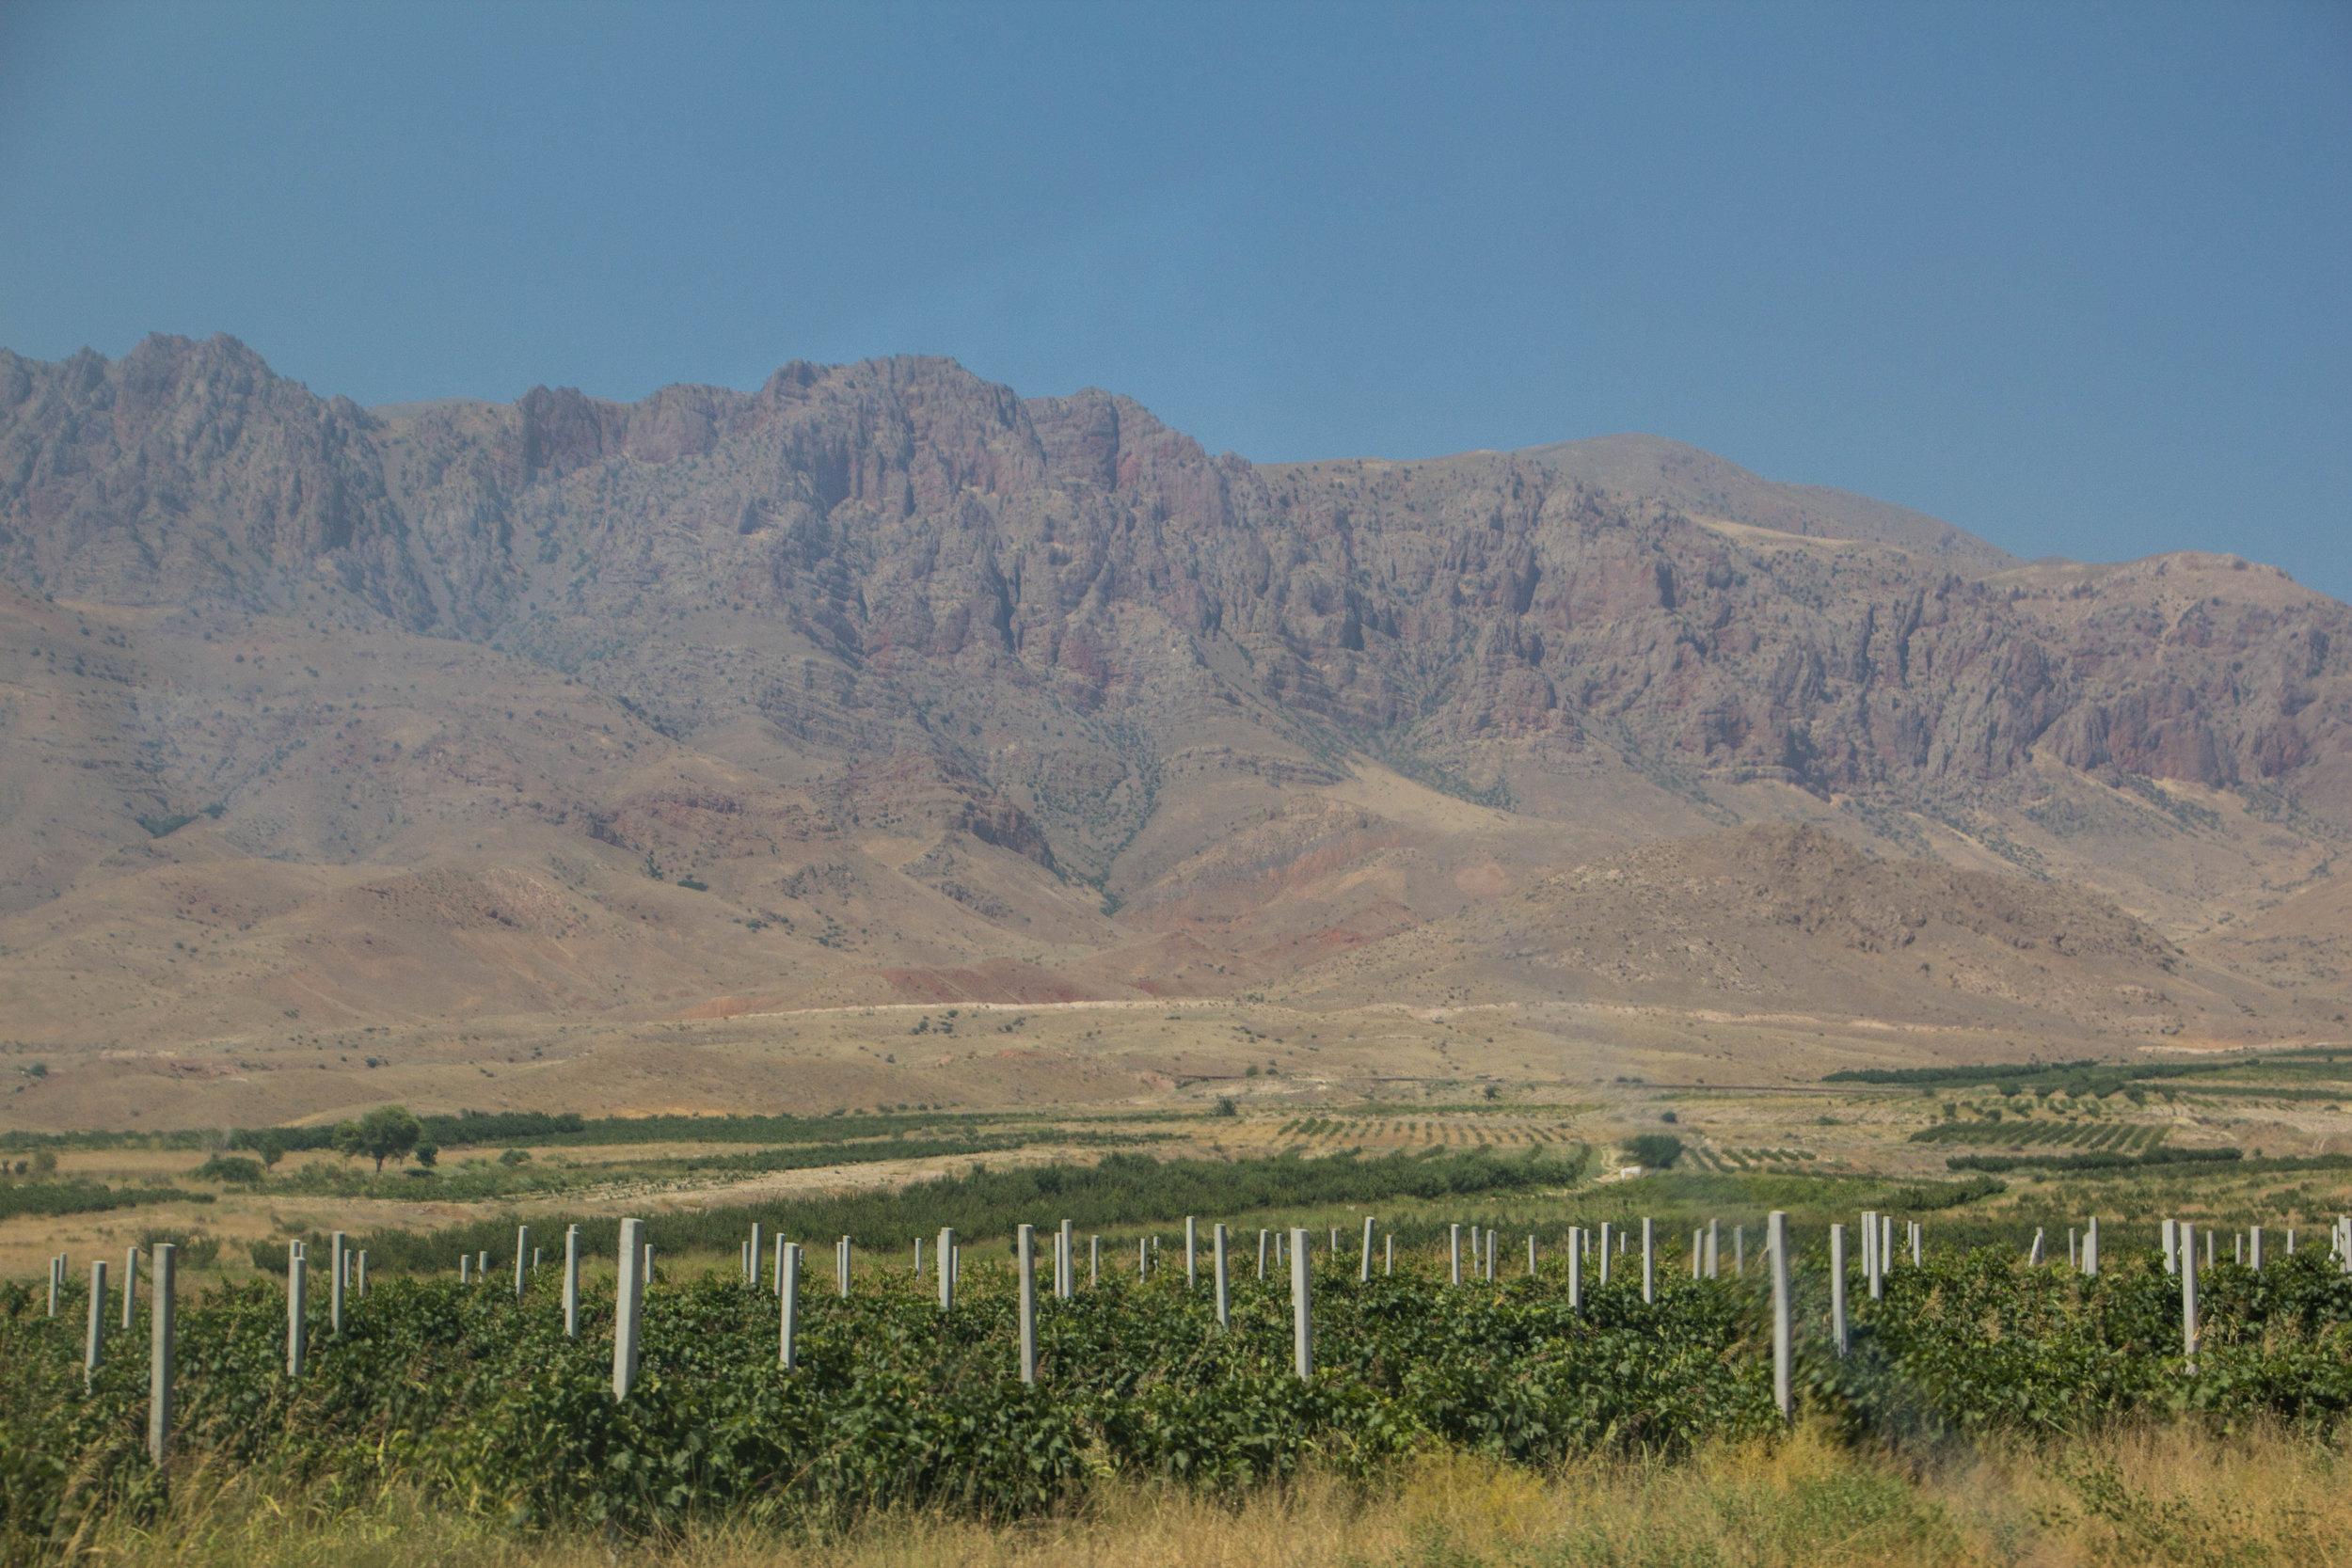 armenia-azerbaijan-southern-border-11.jpg